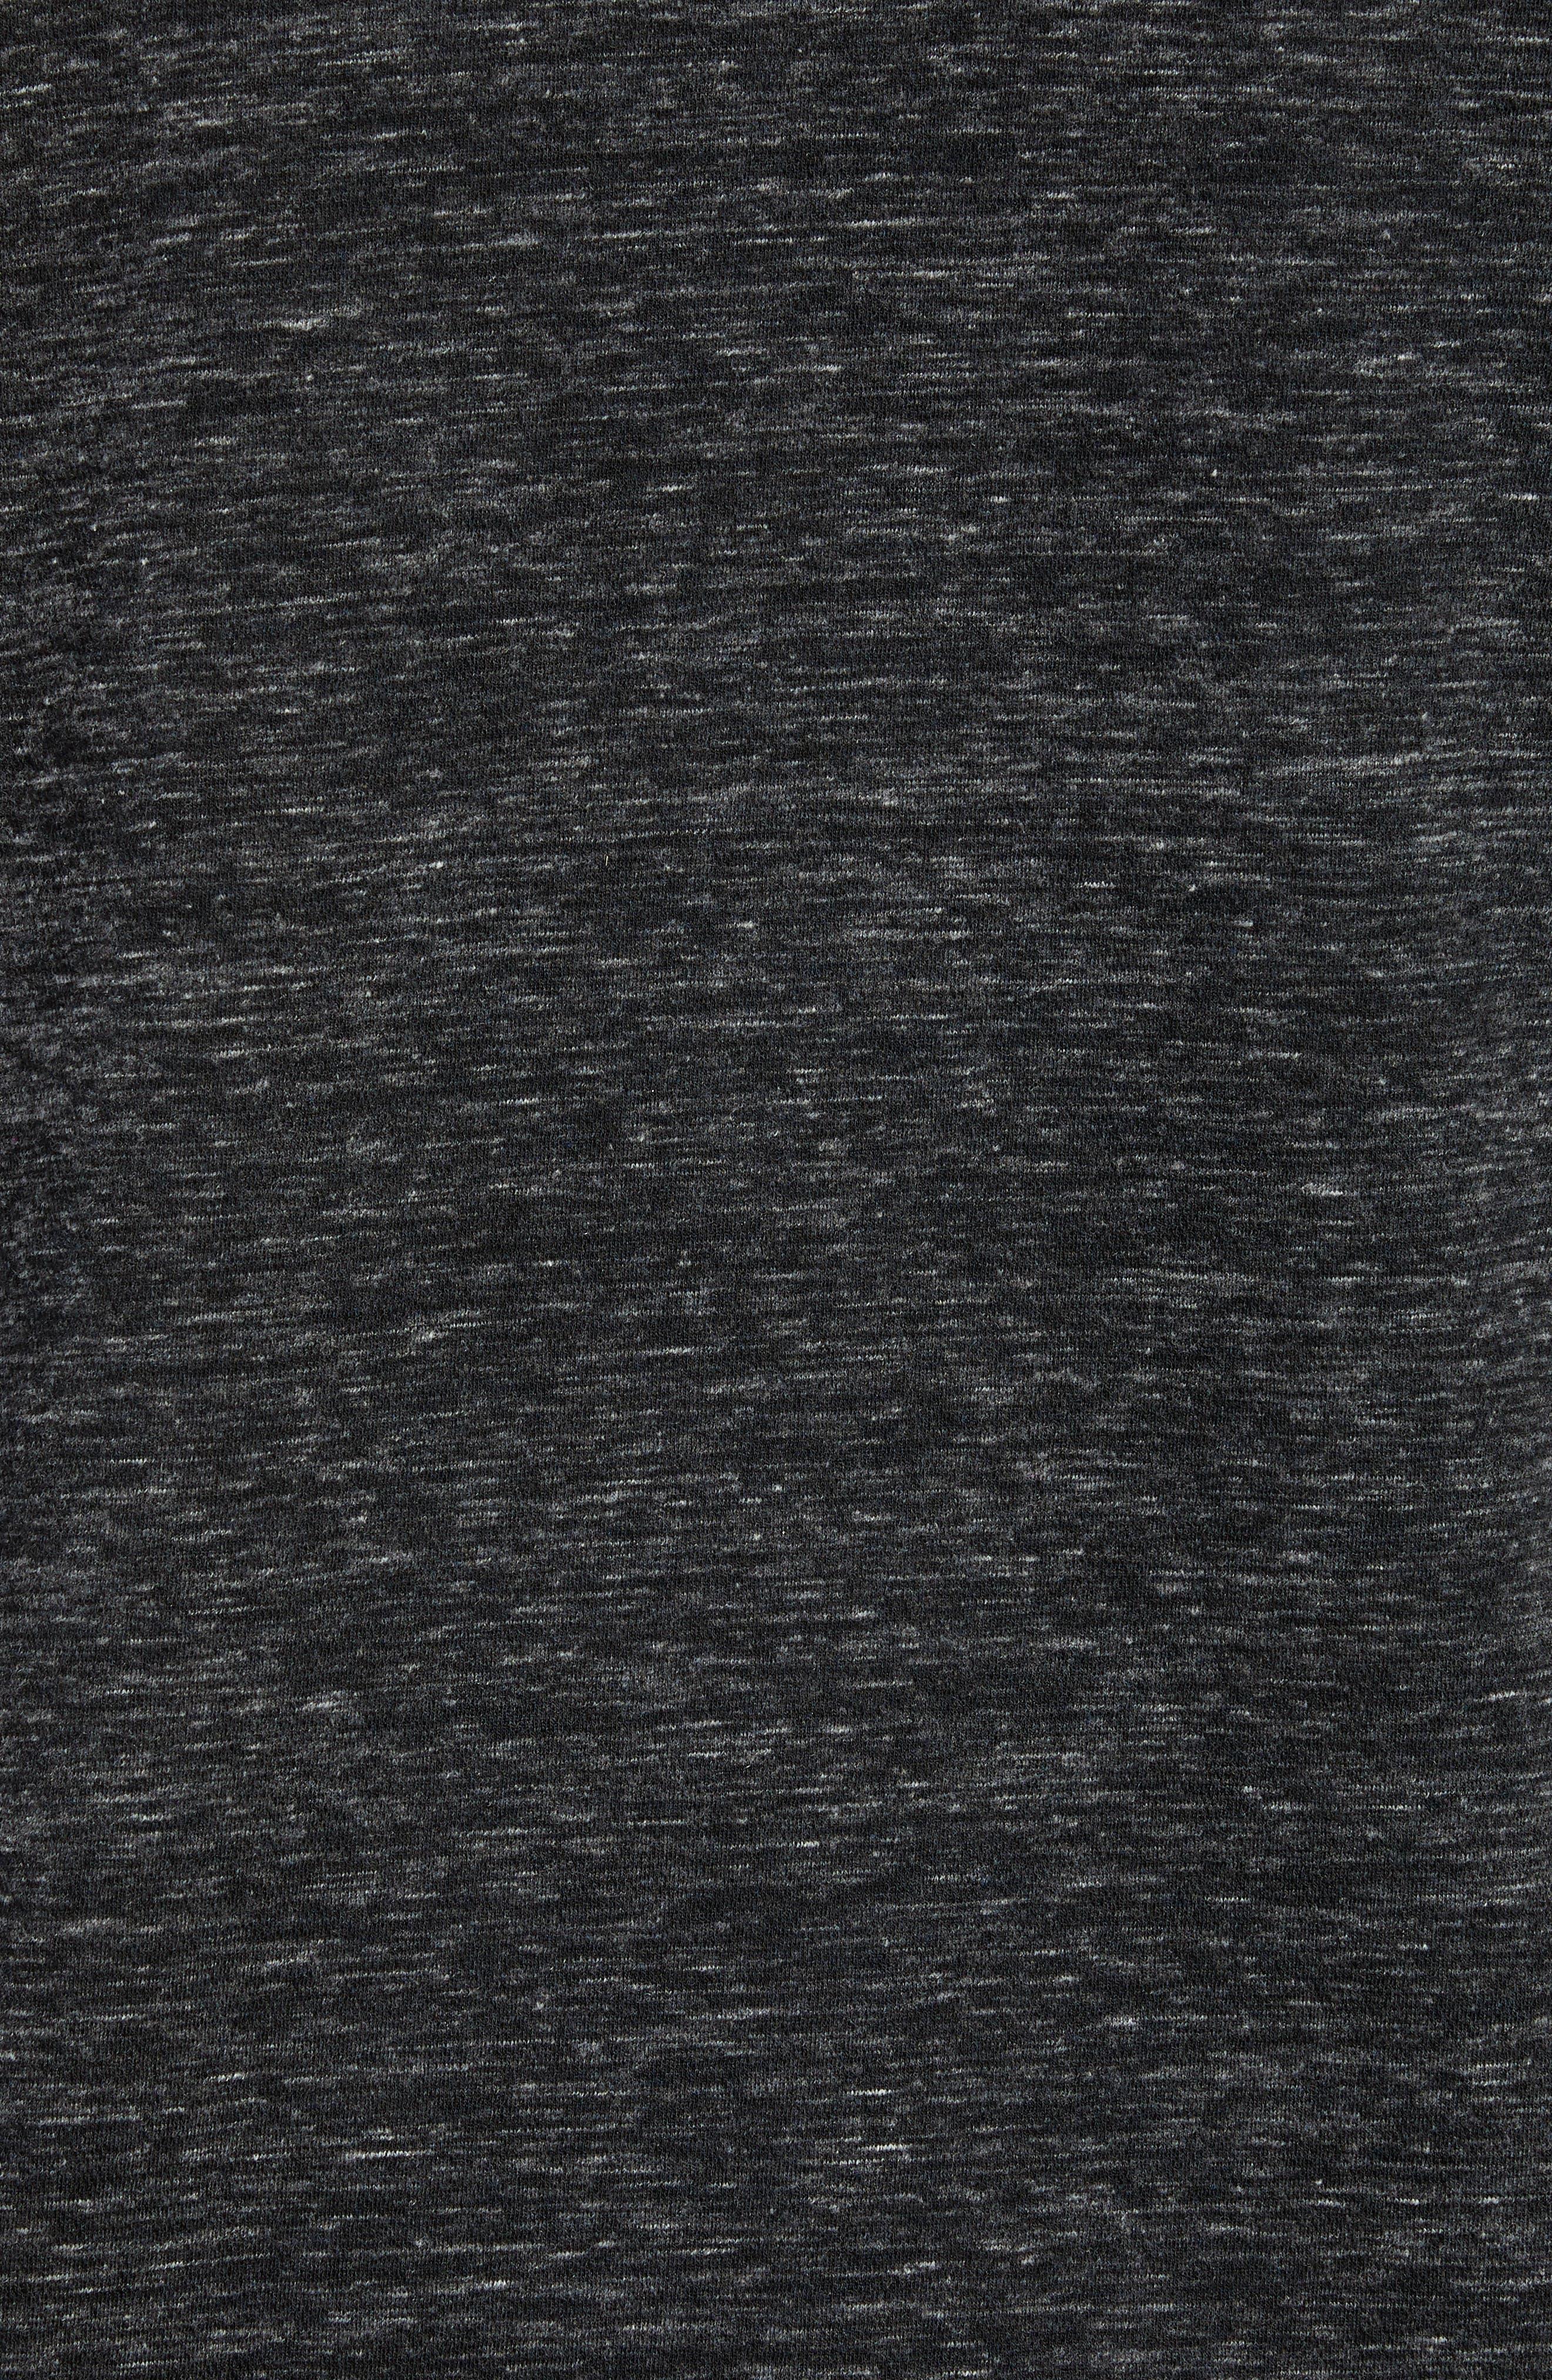 Stretch Knit Bomber Jacket,                             Alternate thumbnail 6, color,                             GREY EBONY HEATHER